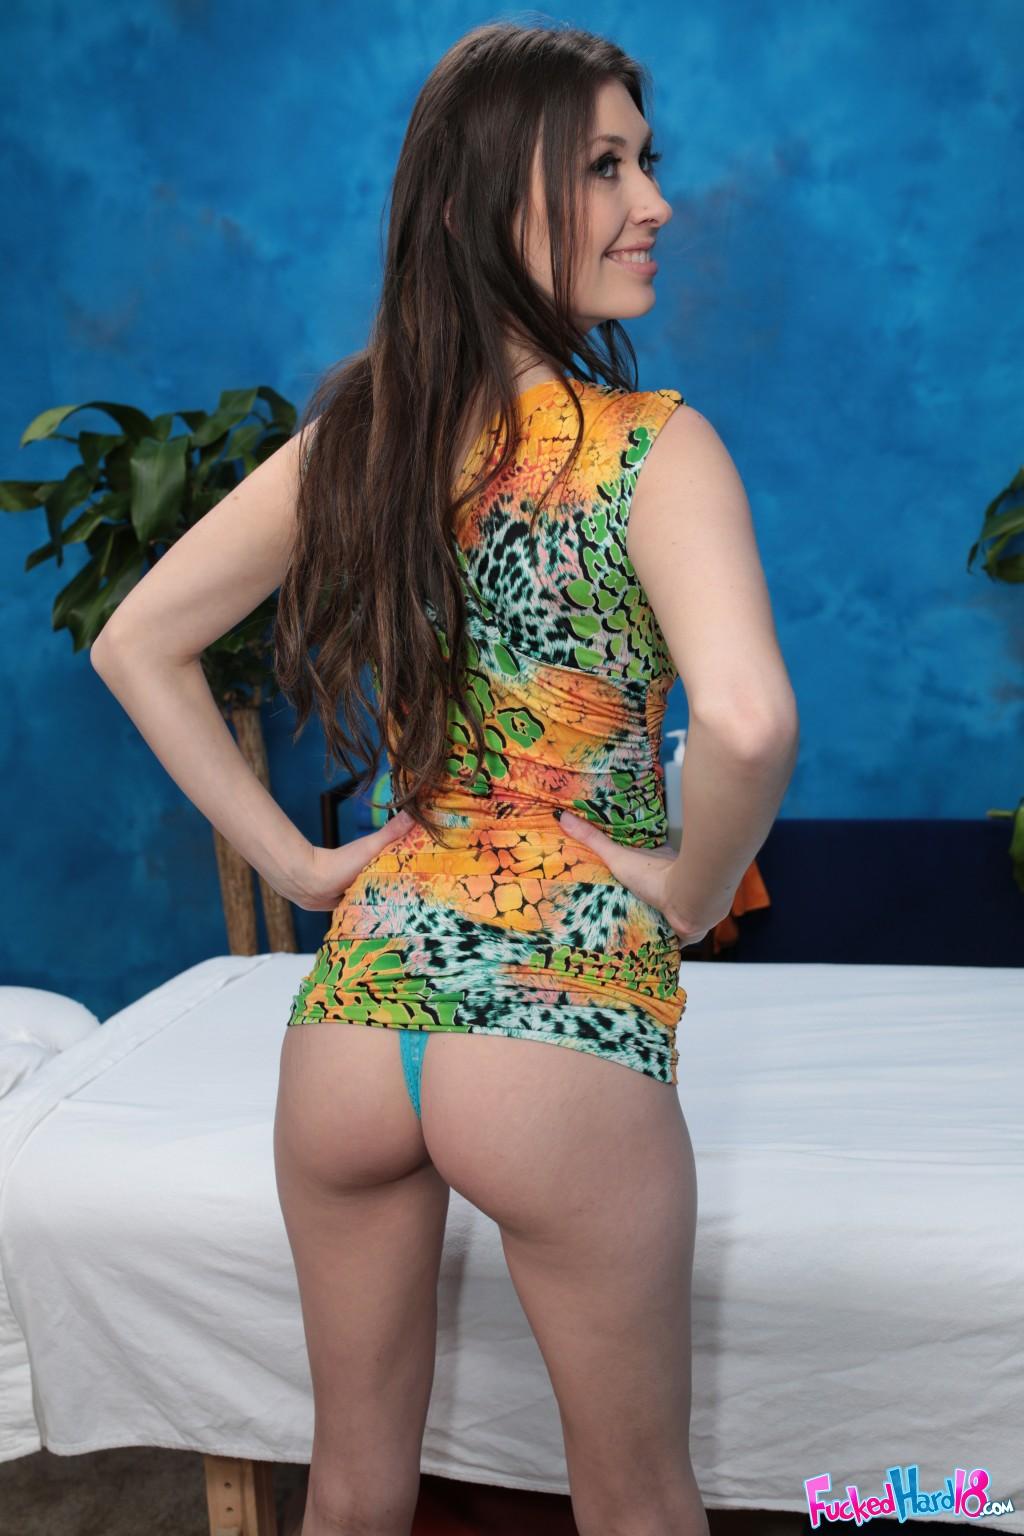 Nude russian girl links